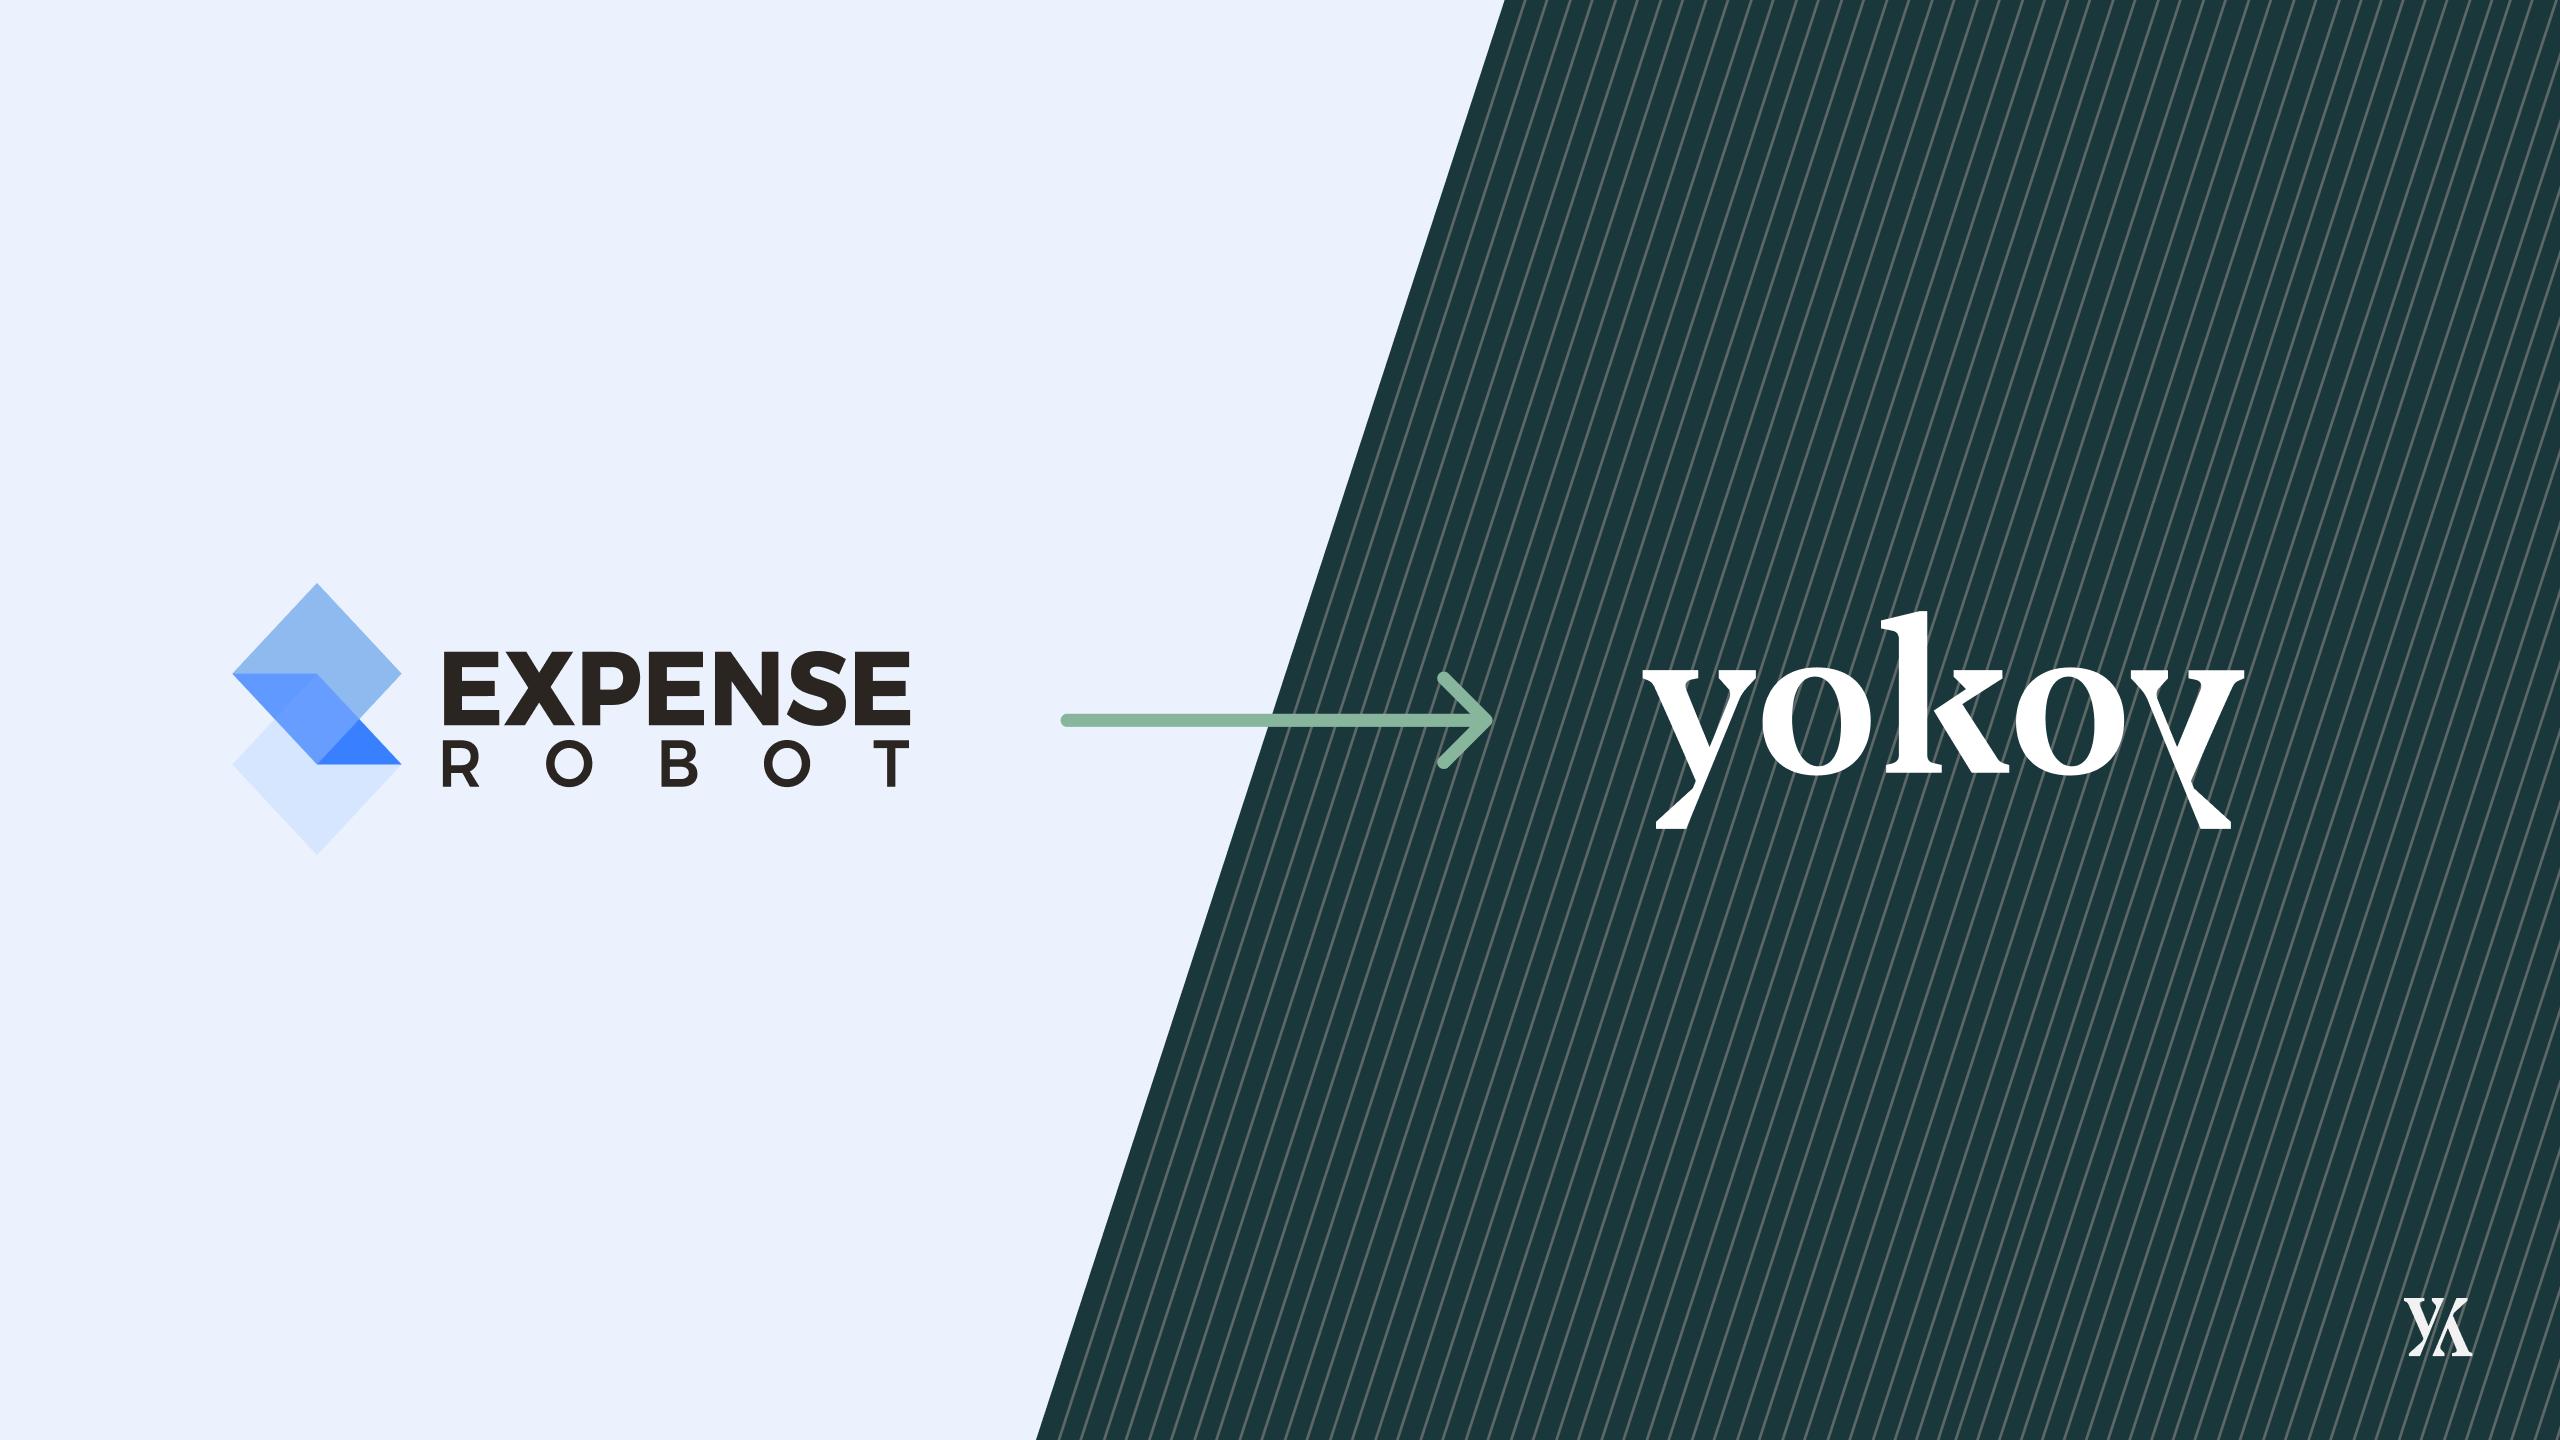 Banner announcing the rebranding of Expense Robot to Yokoy